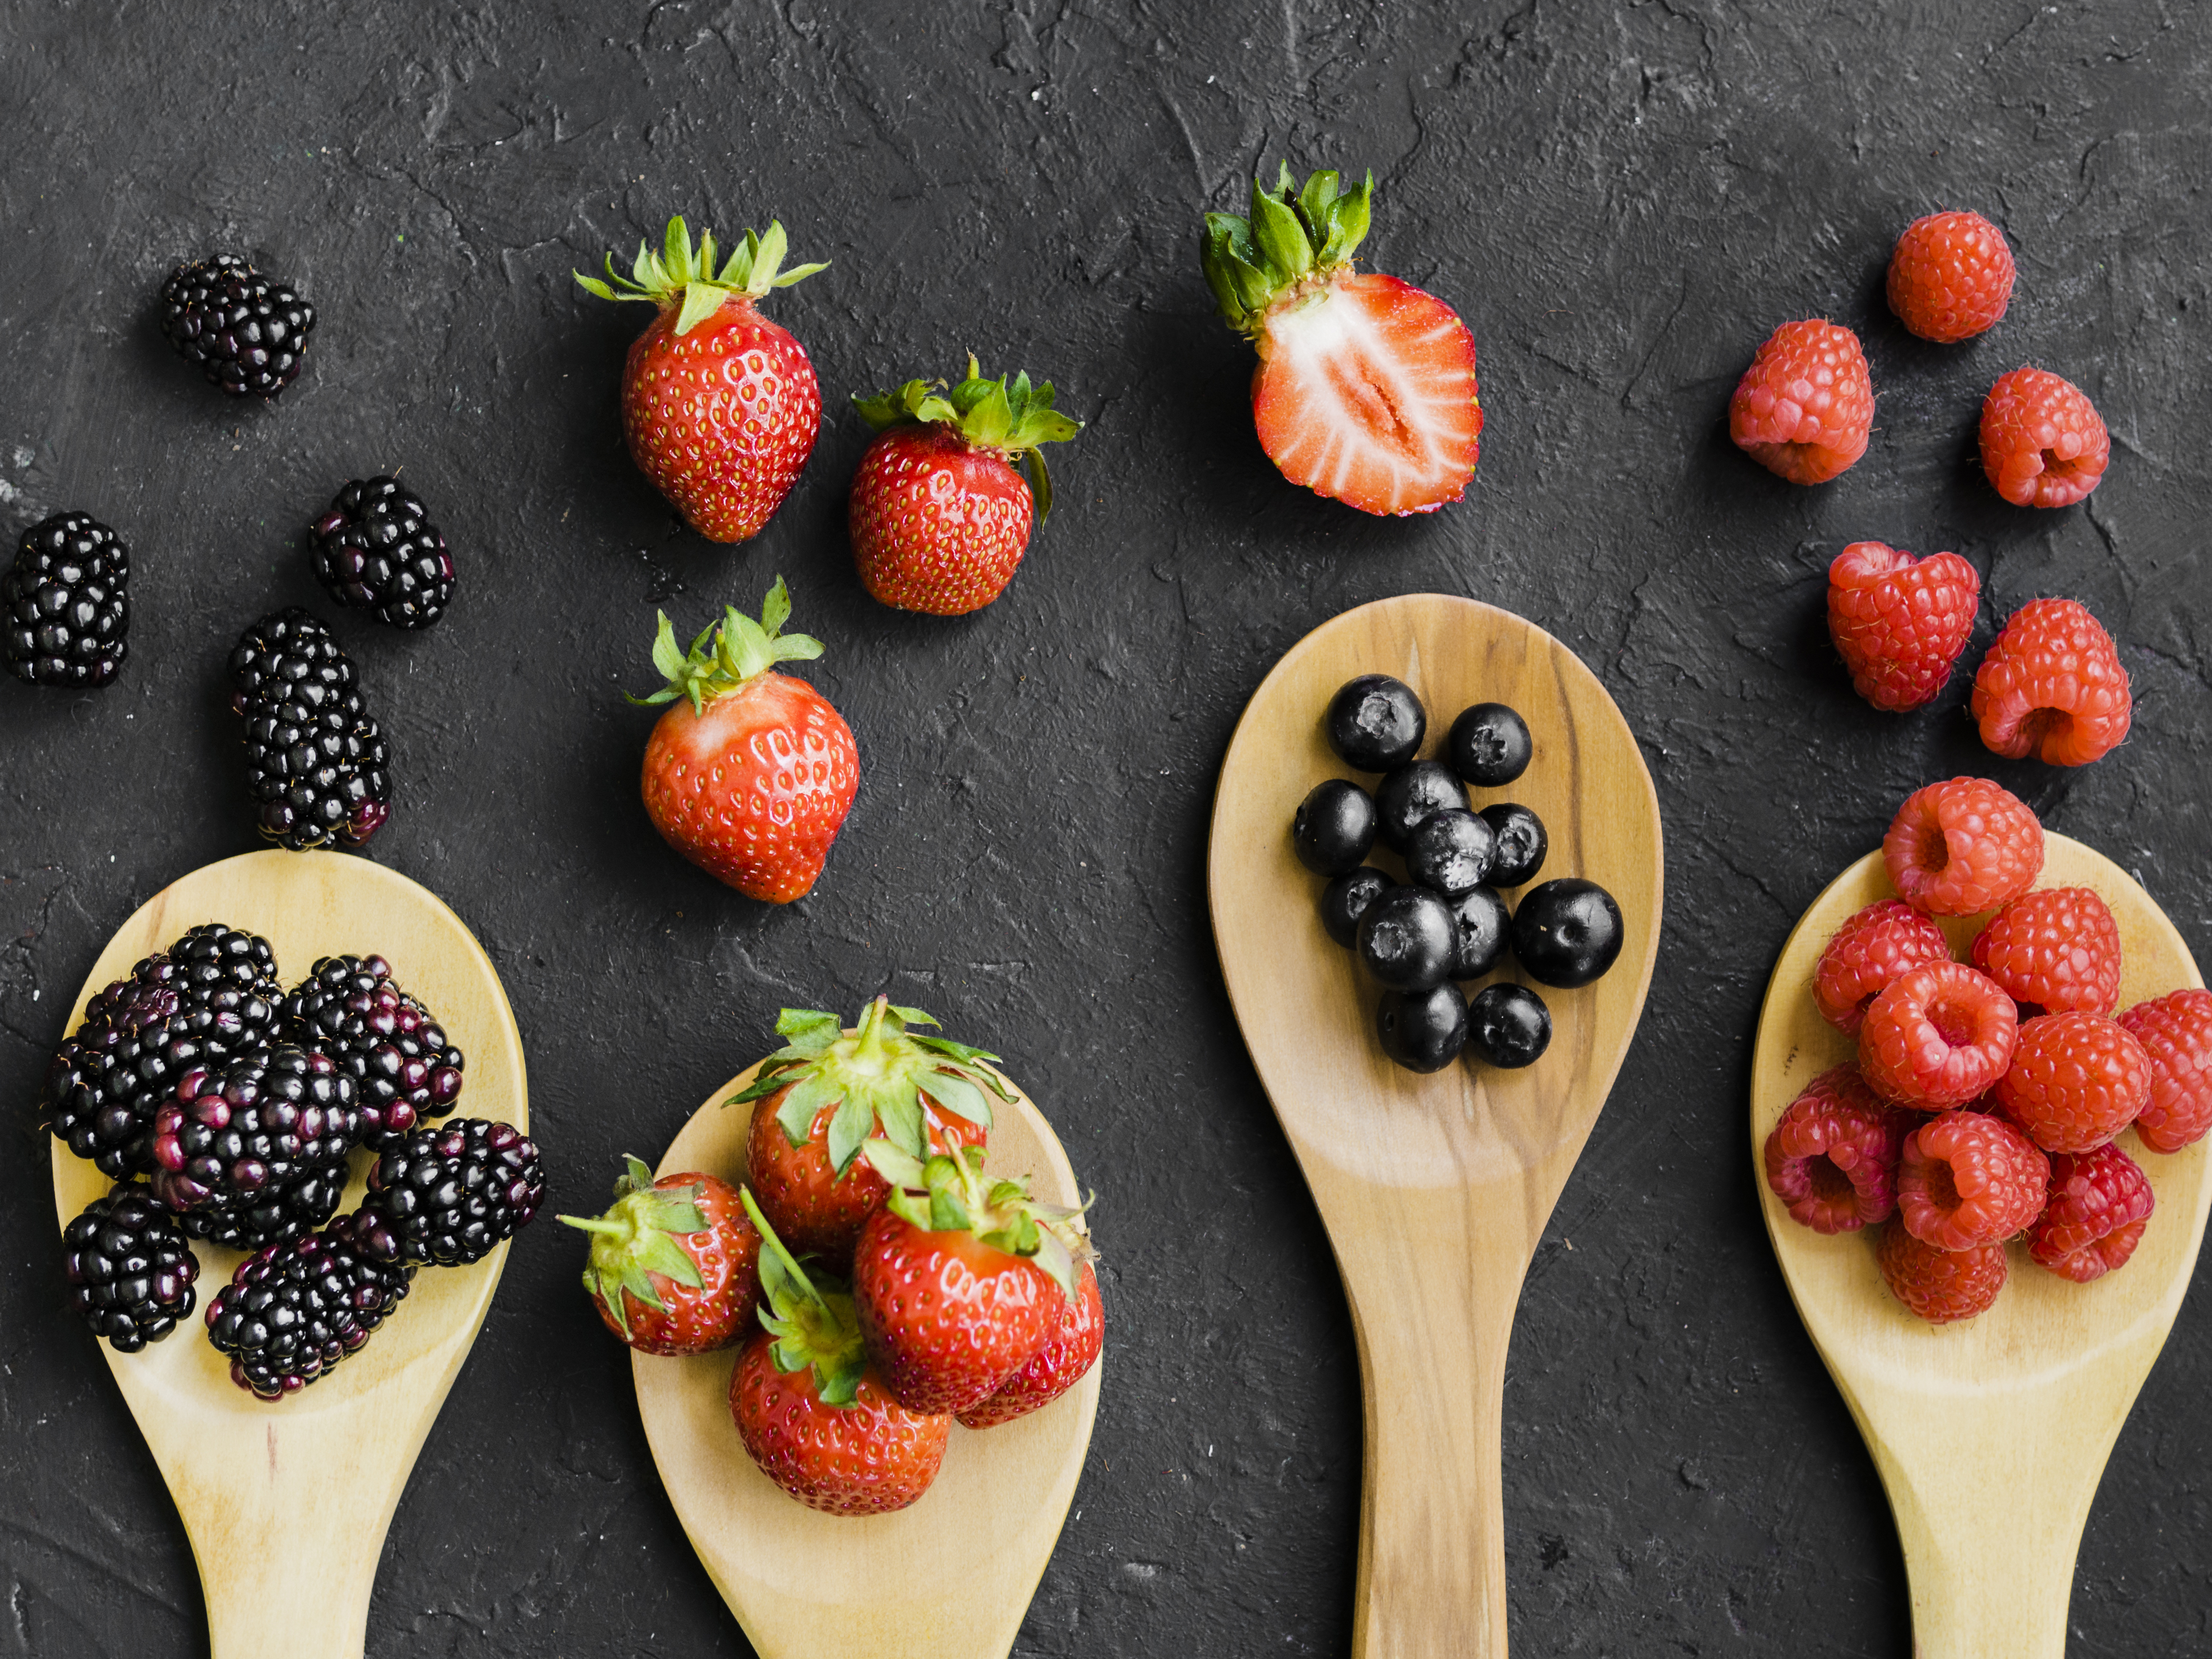 Owoce jagodowe jako naturalne źródło polioli